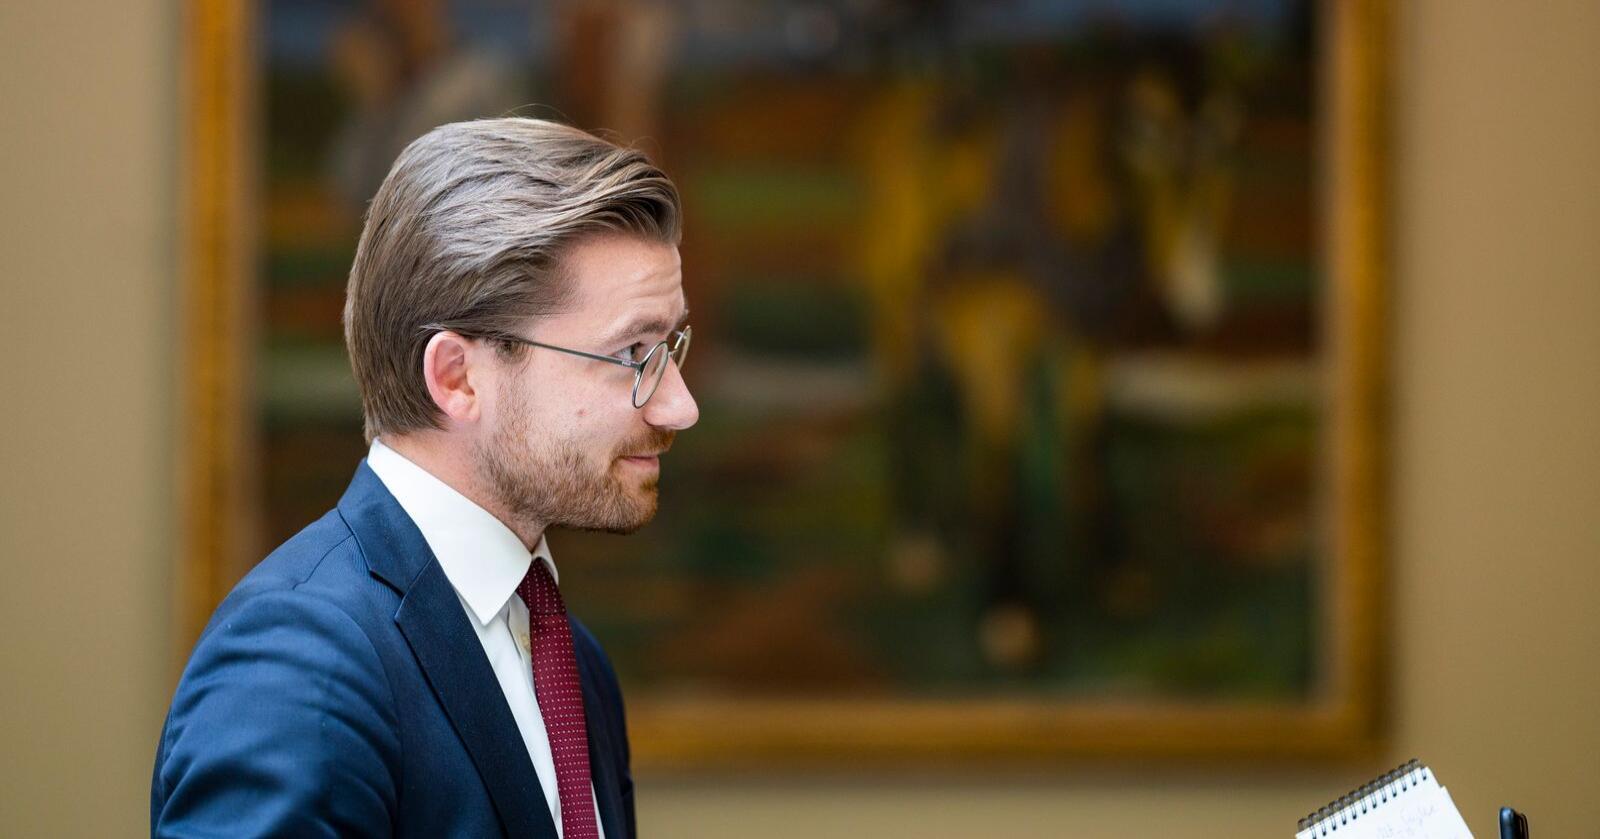 Klima- og miljøminister Sveinung Rotevatn (V) etter Stortingets muntlige spørretime onsdag. Foto: Håkon Mosvold Larsen / NTB scanpix